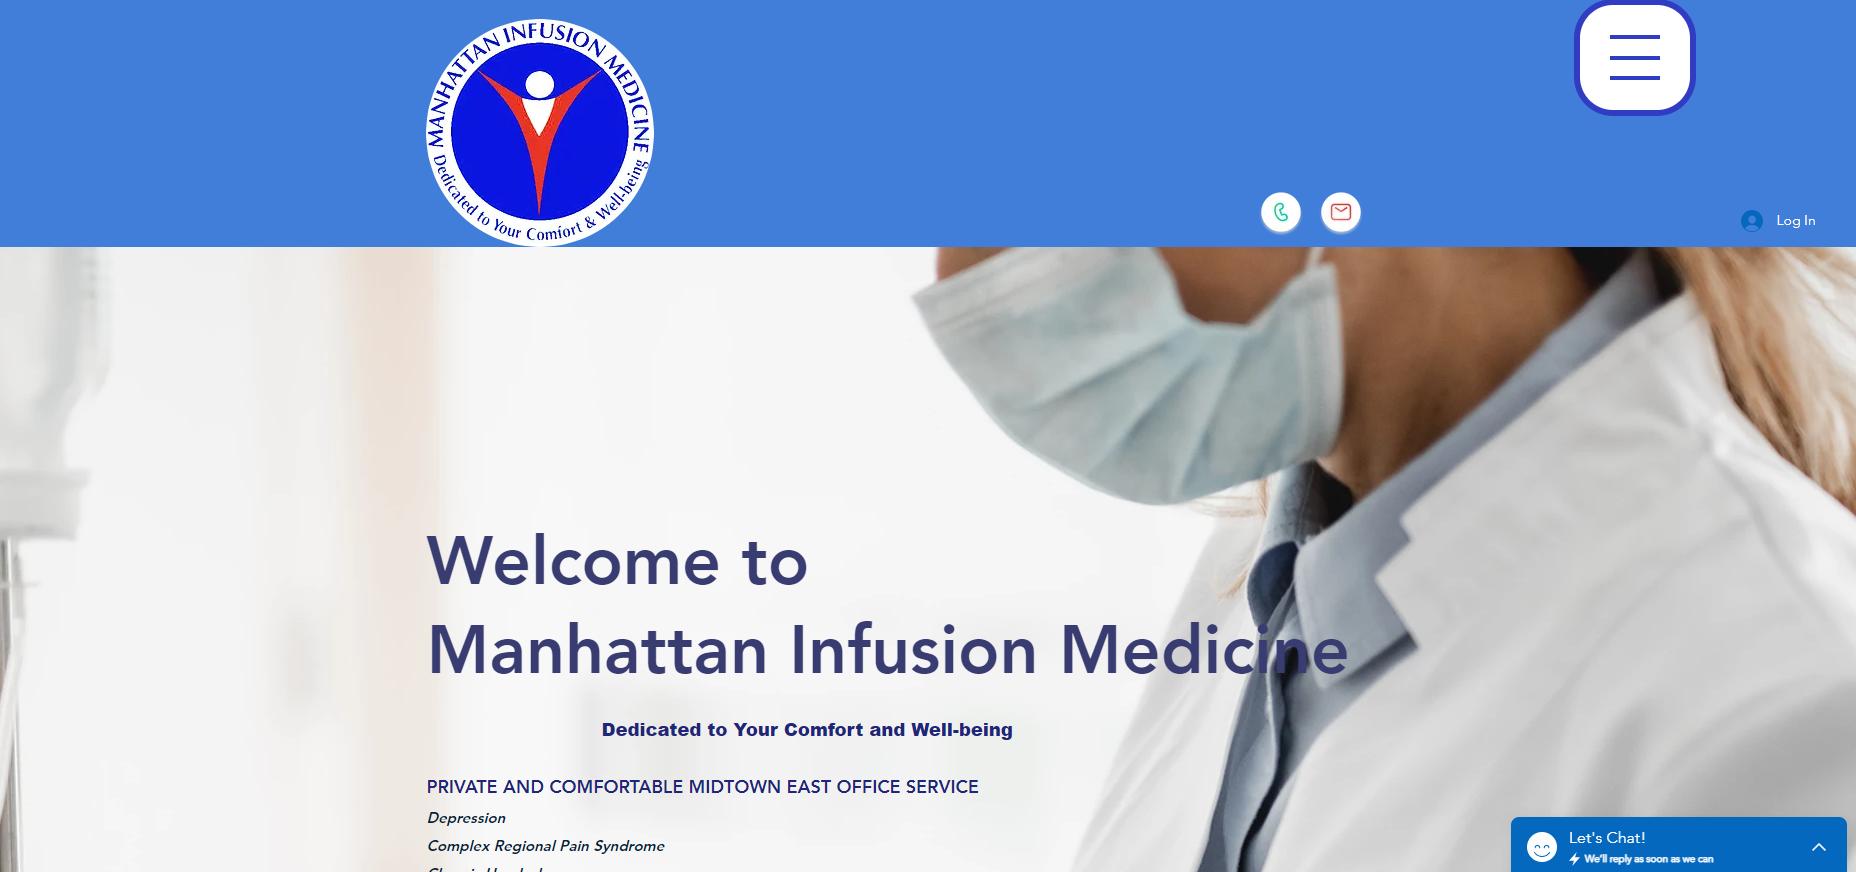 Manhattan Infusion Medicine